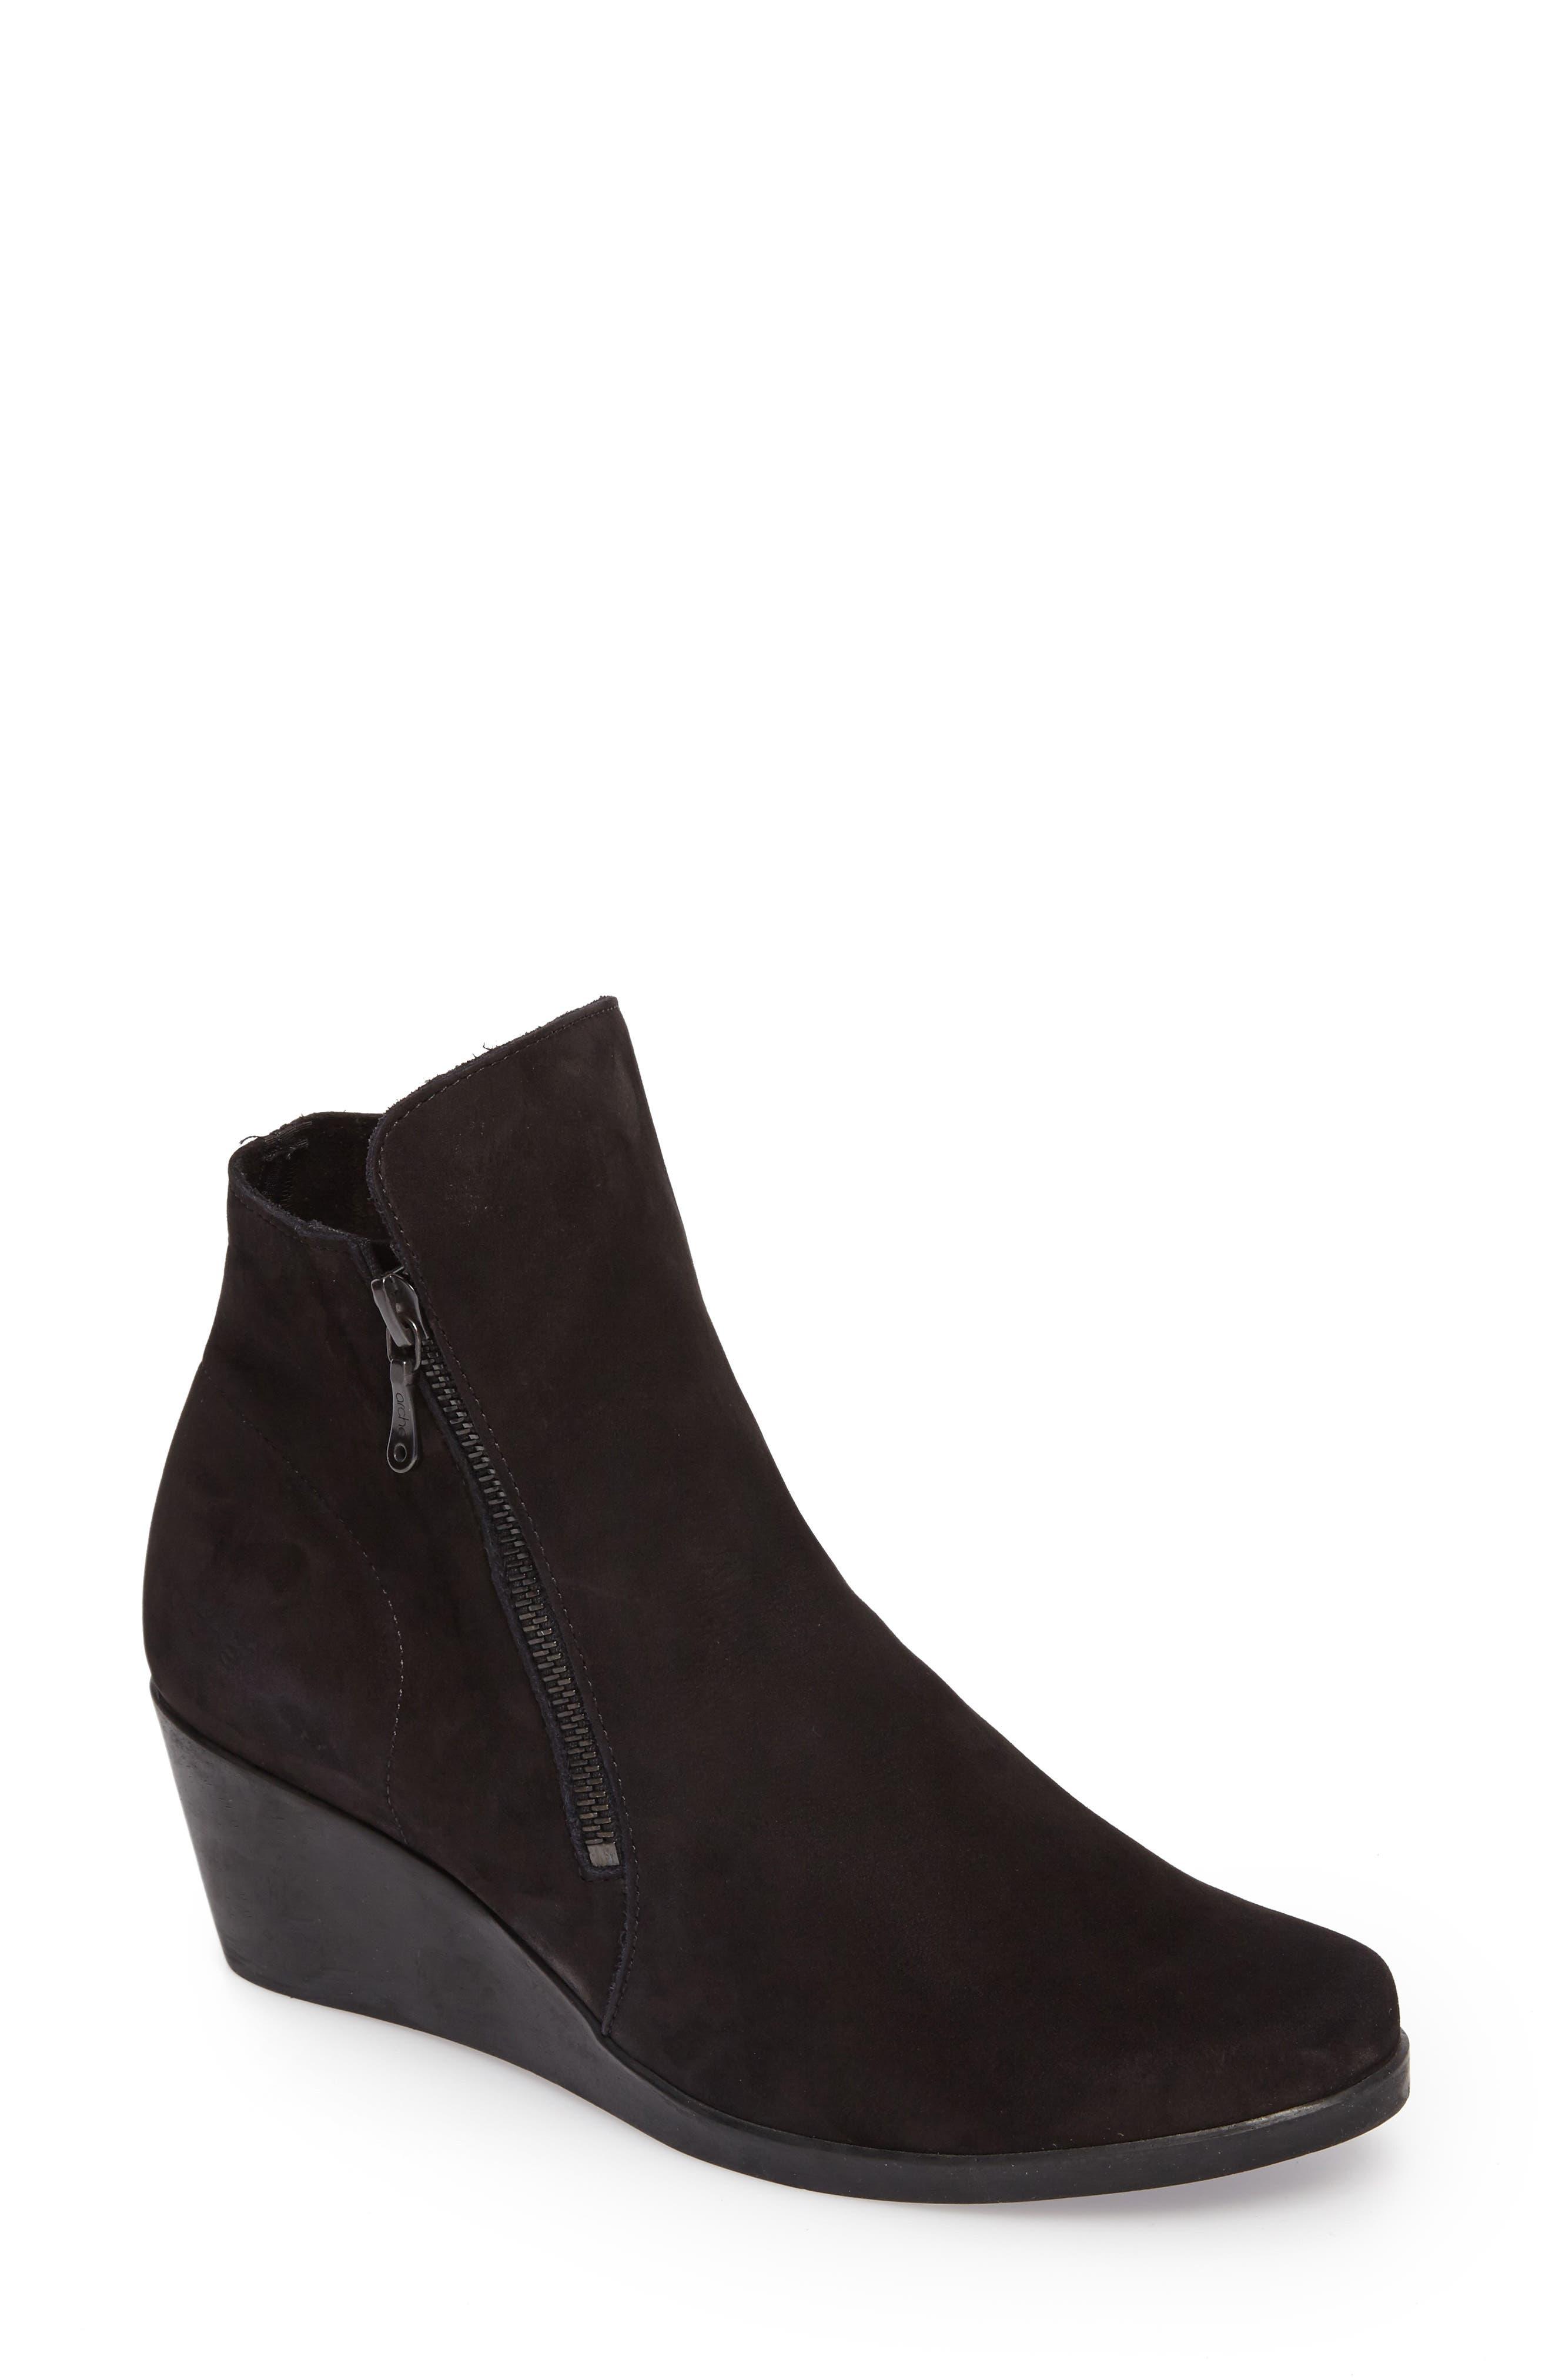 Jolia Water Resistant Bootie,                         Main,                         color, Noir Nubuck Leather